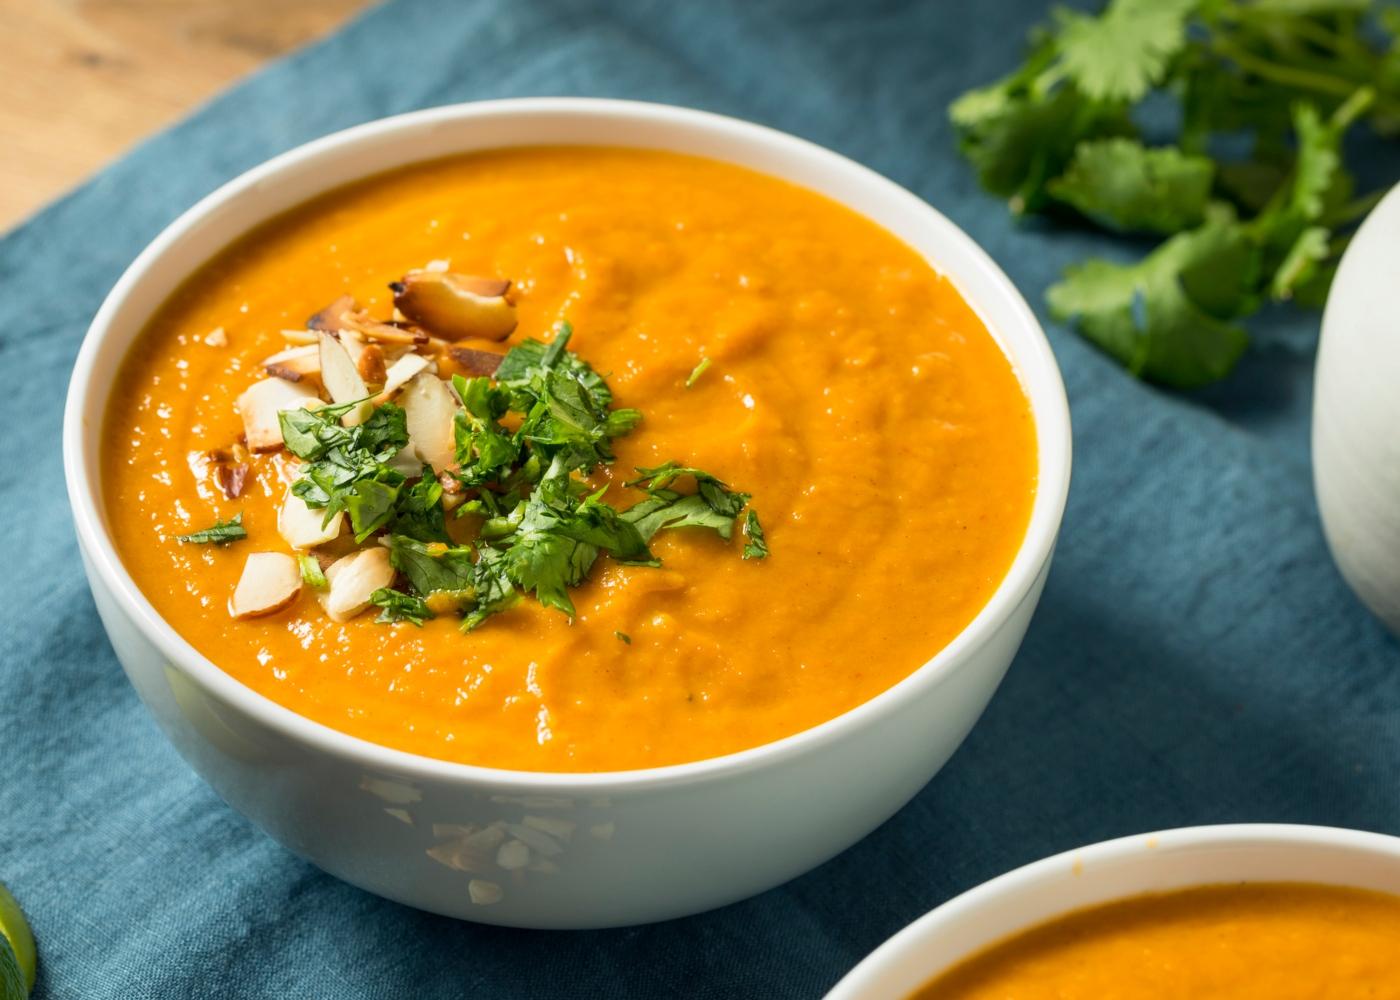 Sopa de batata-doce e gengibre